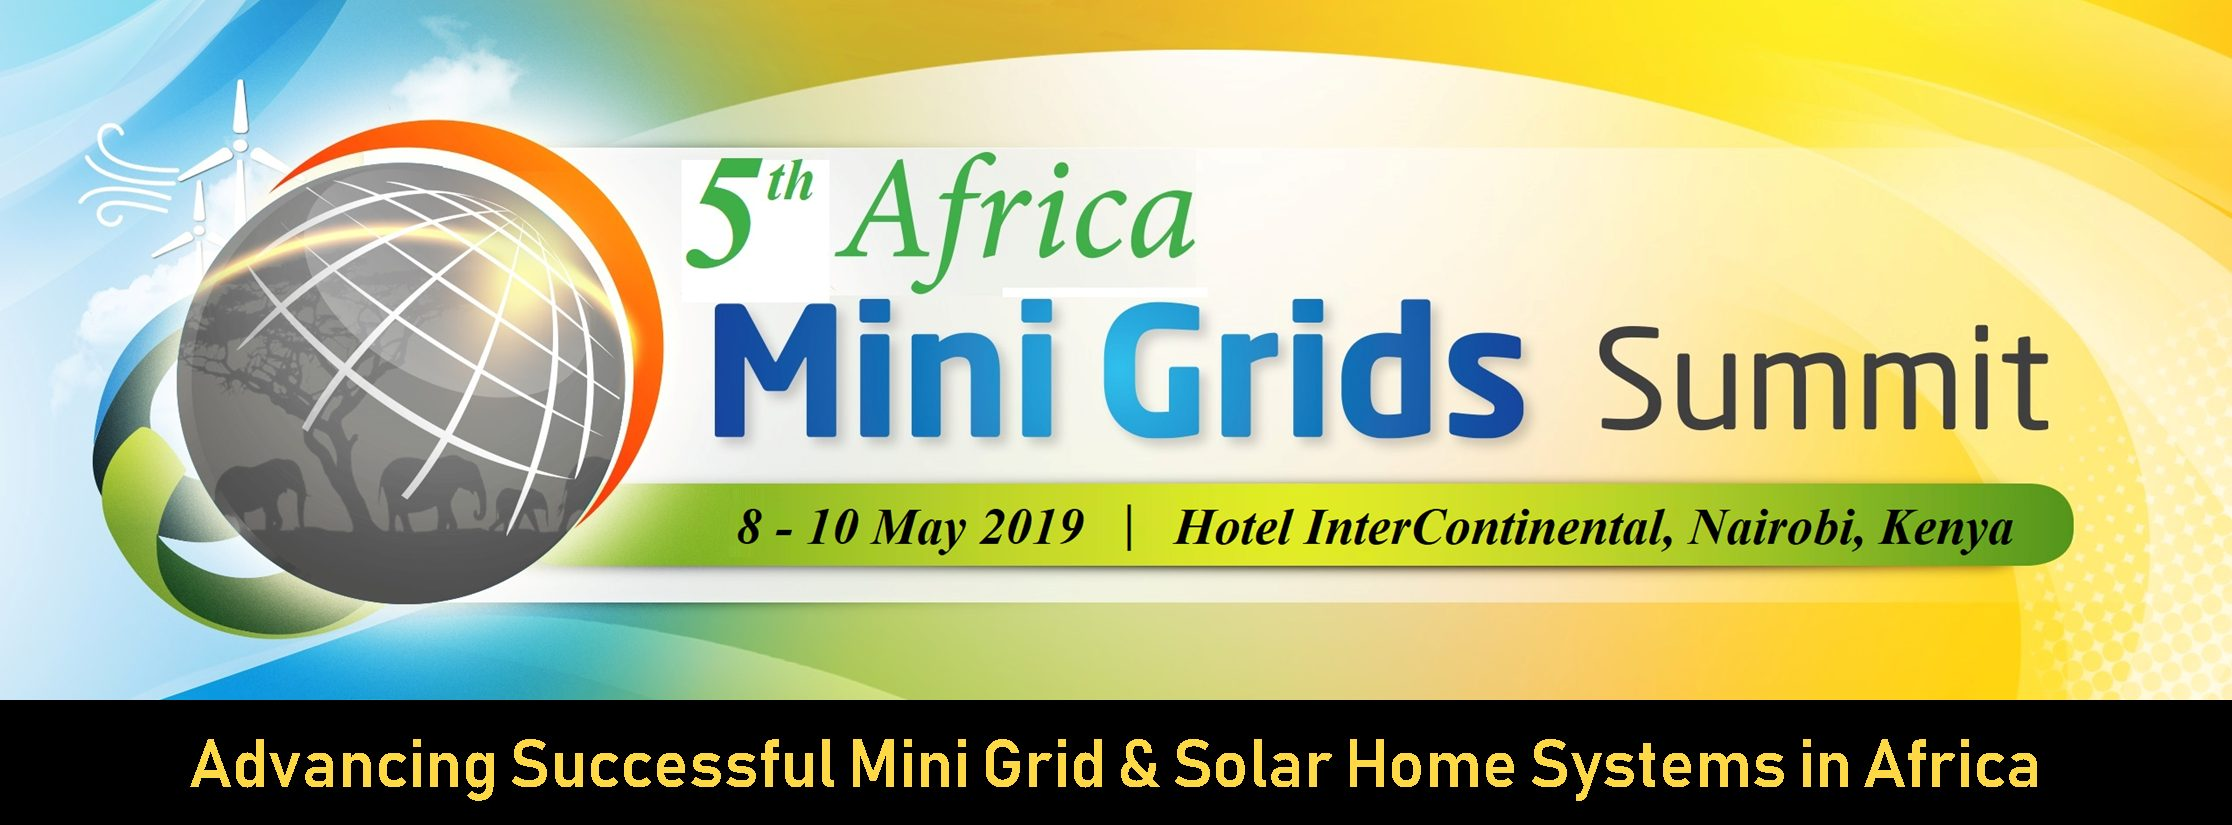 5th Mini Grids Summit - May 2019 - Nairobi, Kenya